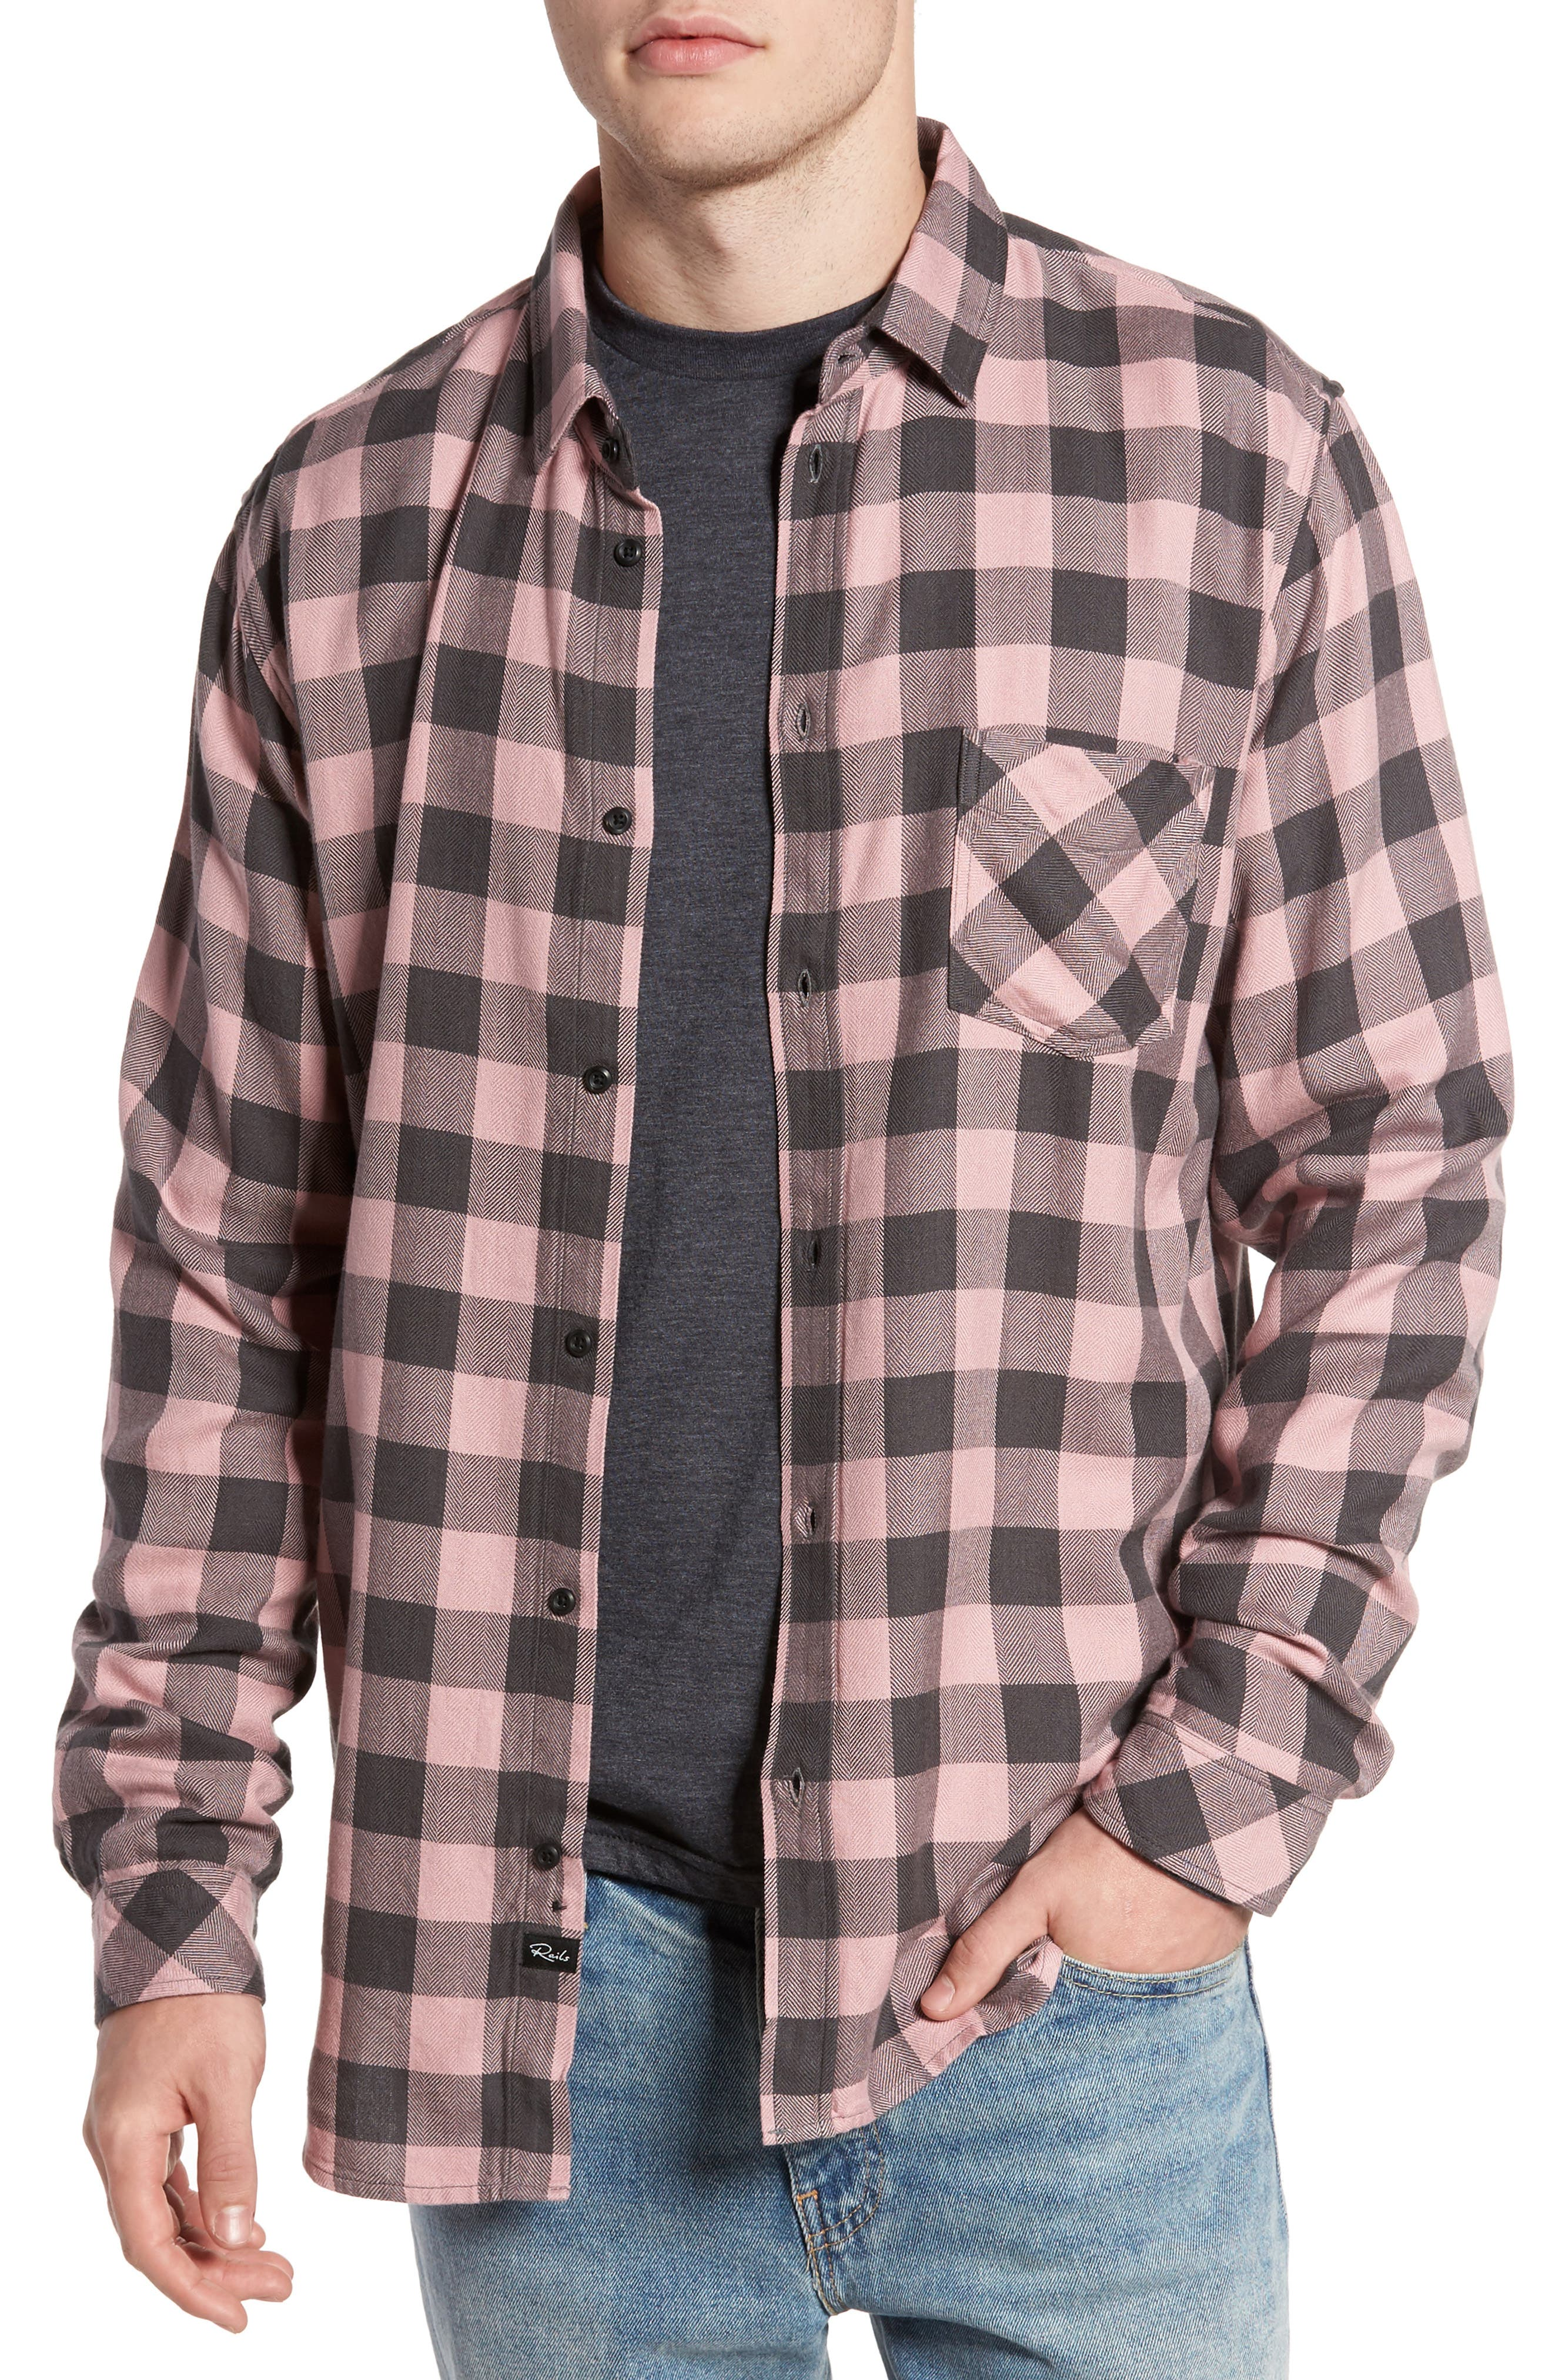 Lennox Sport Shirt,                         Main,                         color, Pale Pink/ Charcoal